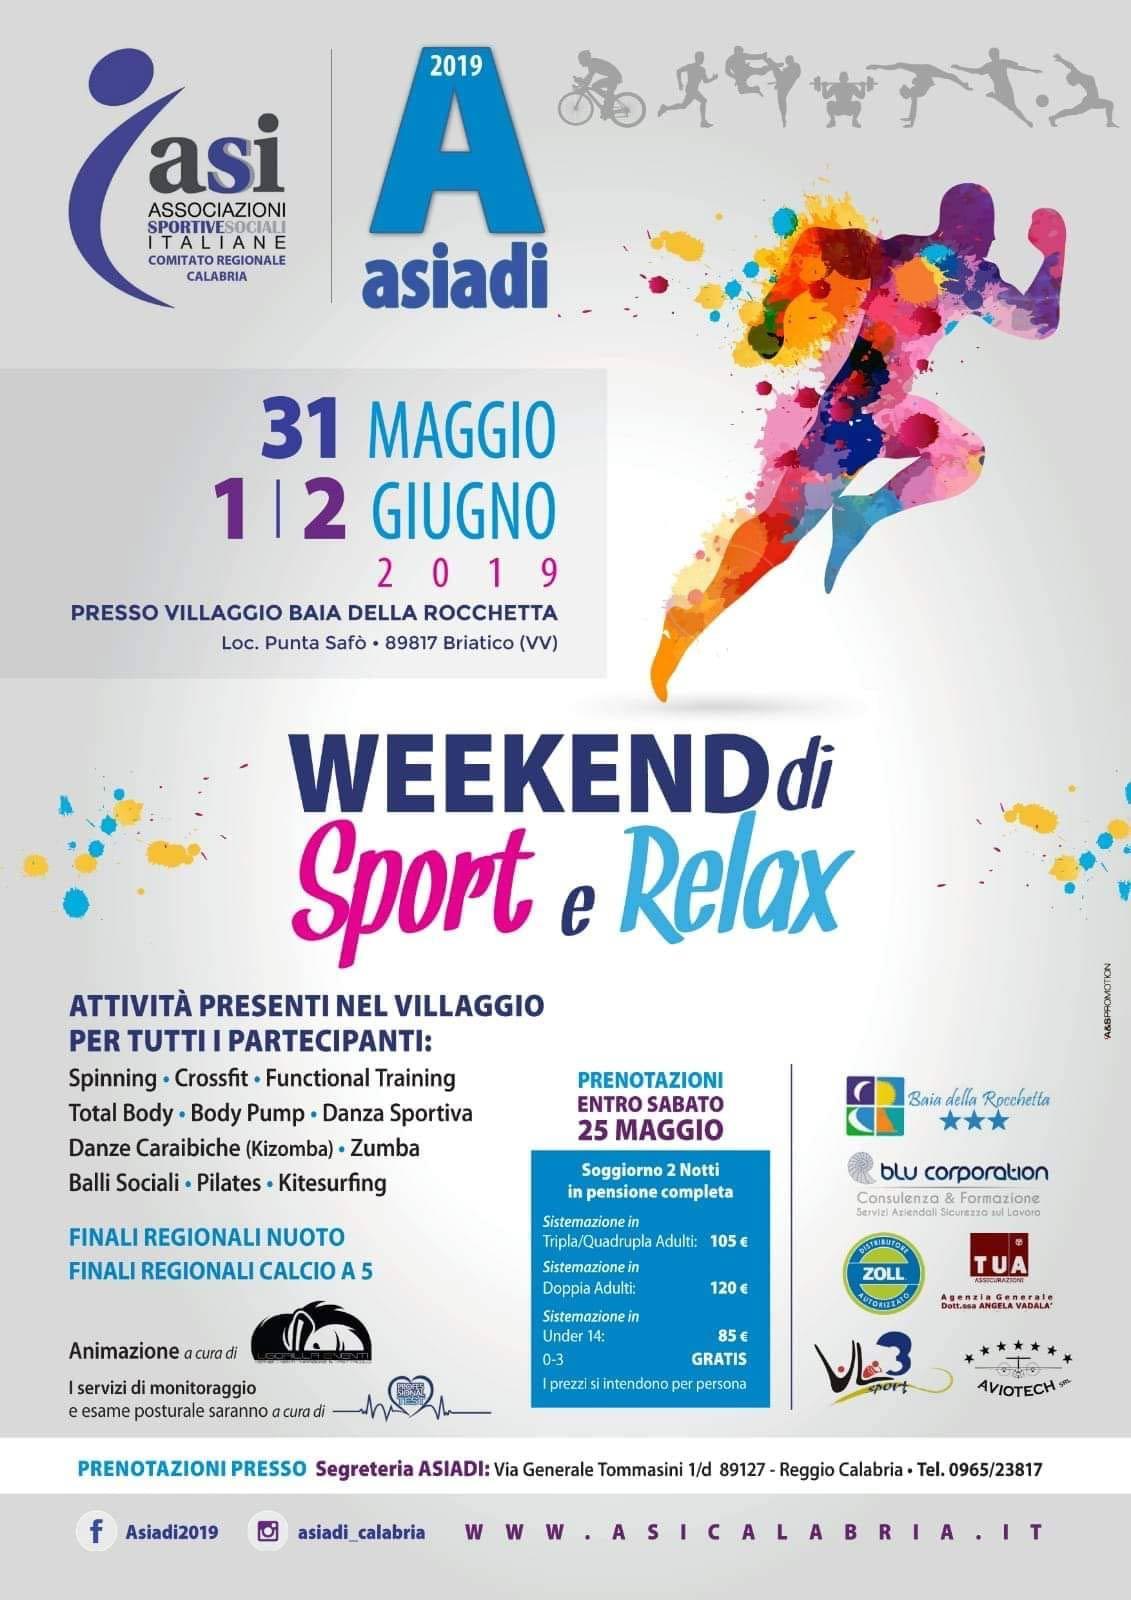 Asiadi 2019